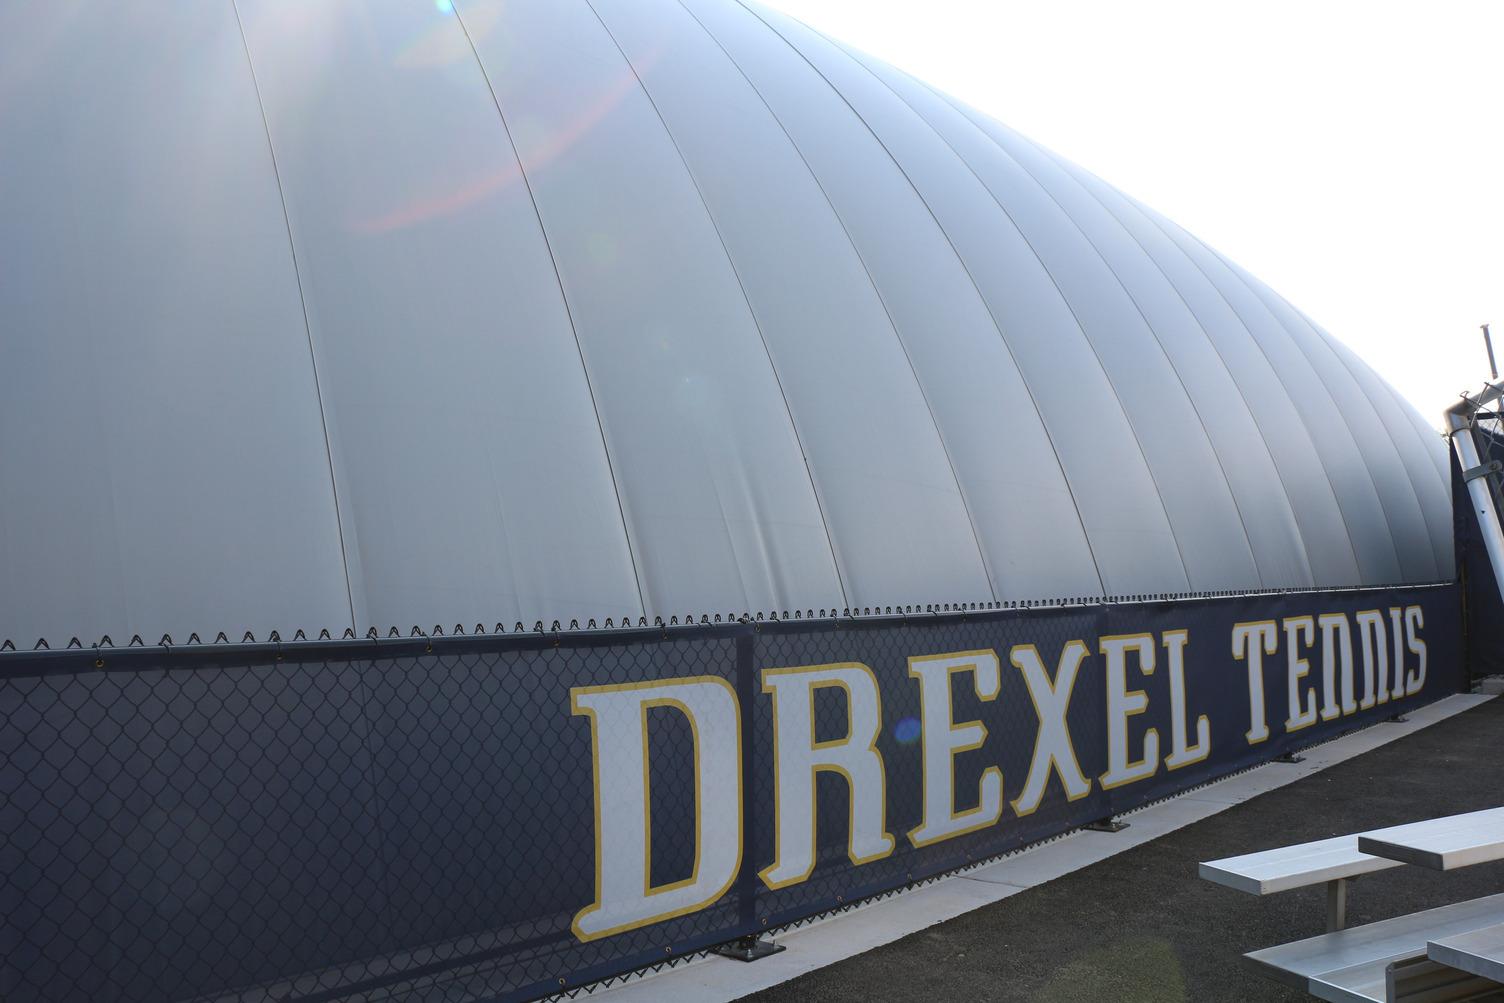 DuPont Tedlar Wallcovering Film Drexel University Vidas Athletic Field Inflatable Dome Exterior Protective Film